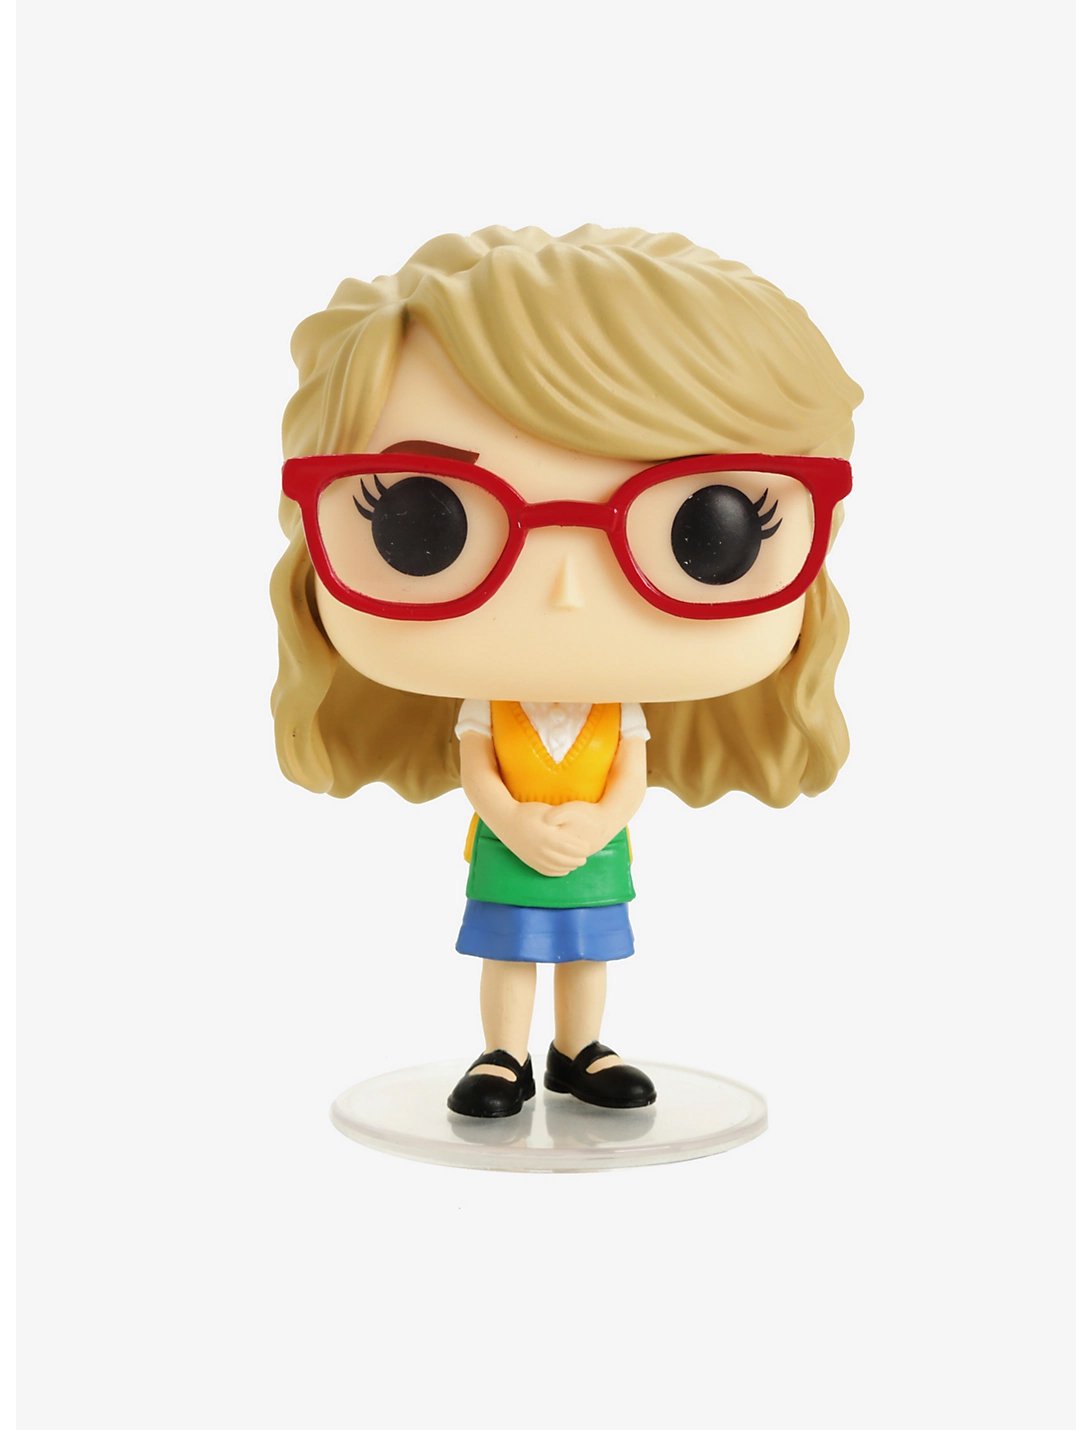 Bernadette Rostenkowski #783 - The Big Bang Theory - Funko Pop! Television